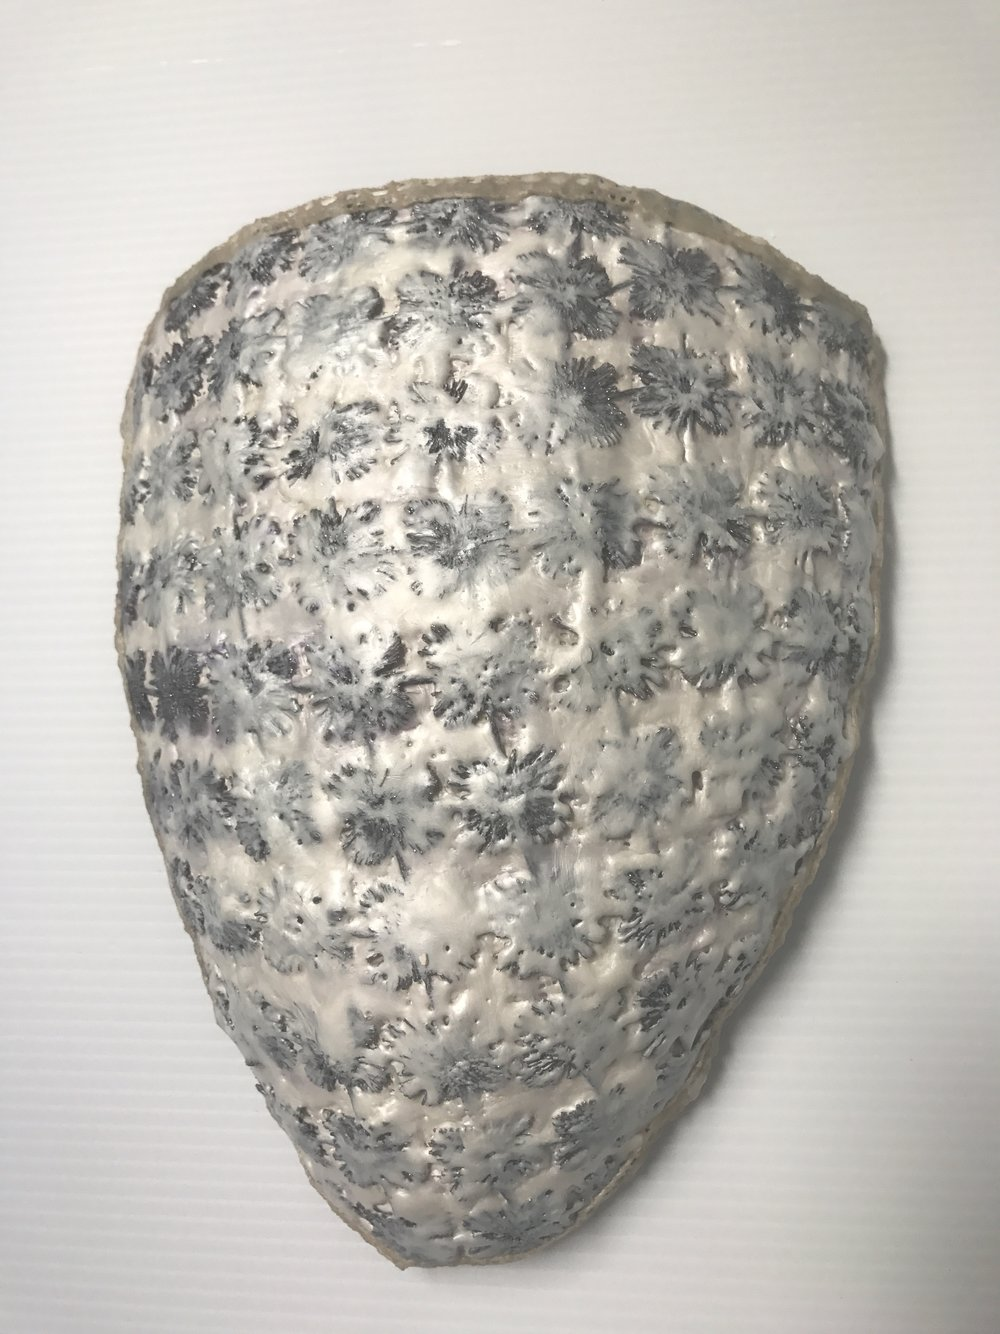 Shield, fiber, paper, encaustic, 10 x 8 x 3 inches, 2017